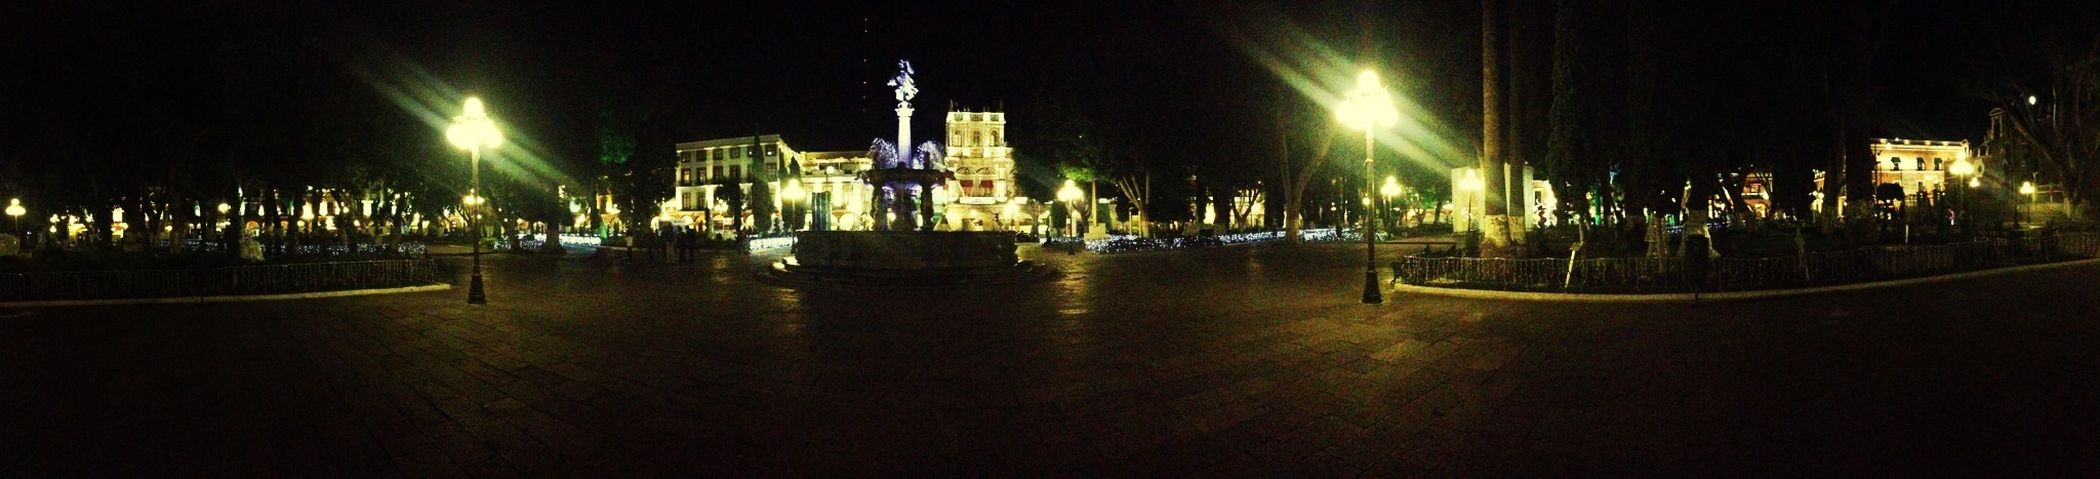 Puebla Zócalo Panorama Cityscapes